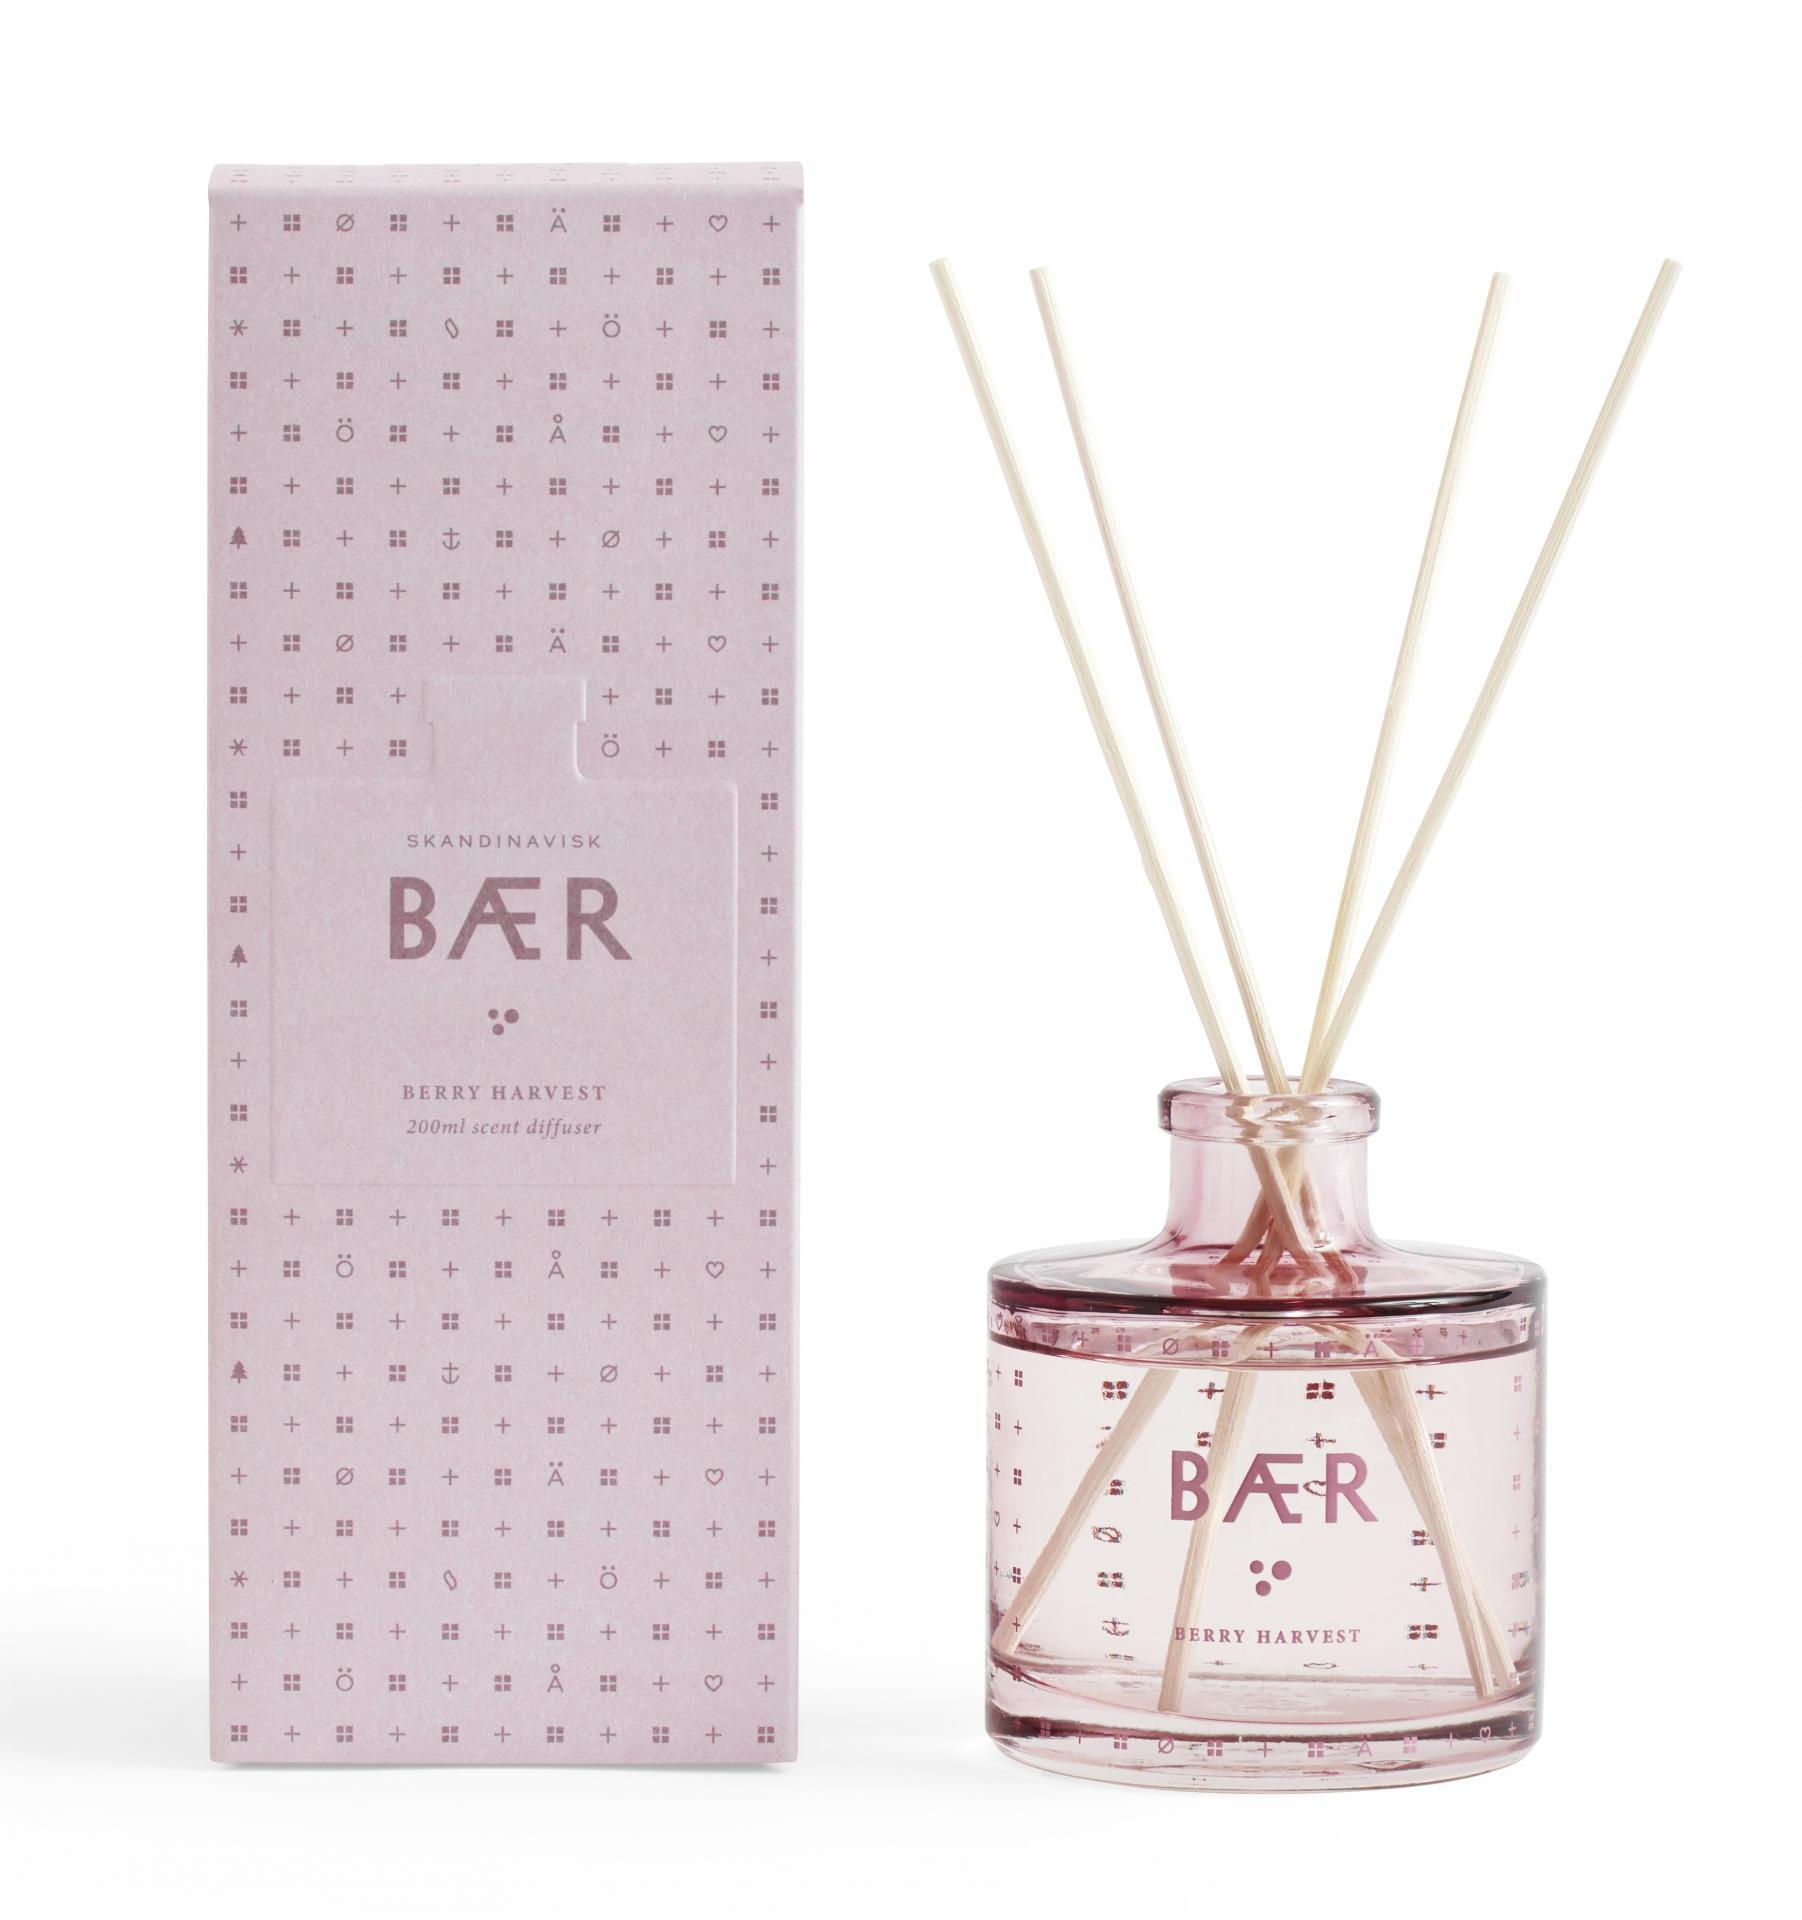 SKANDINAVISK Vonný difuzér BÆR (lesní plody) - 200 ml, růžová barva, sklo